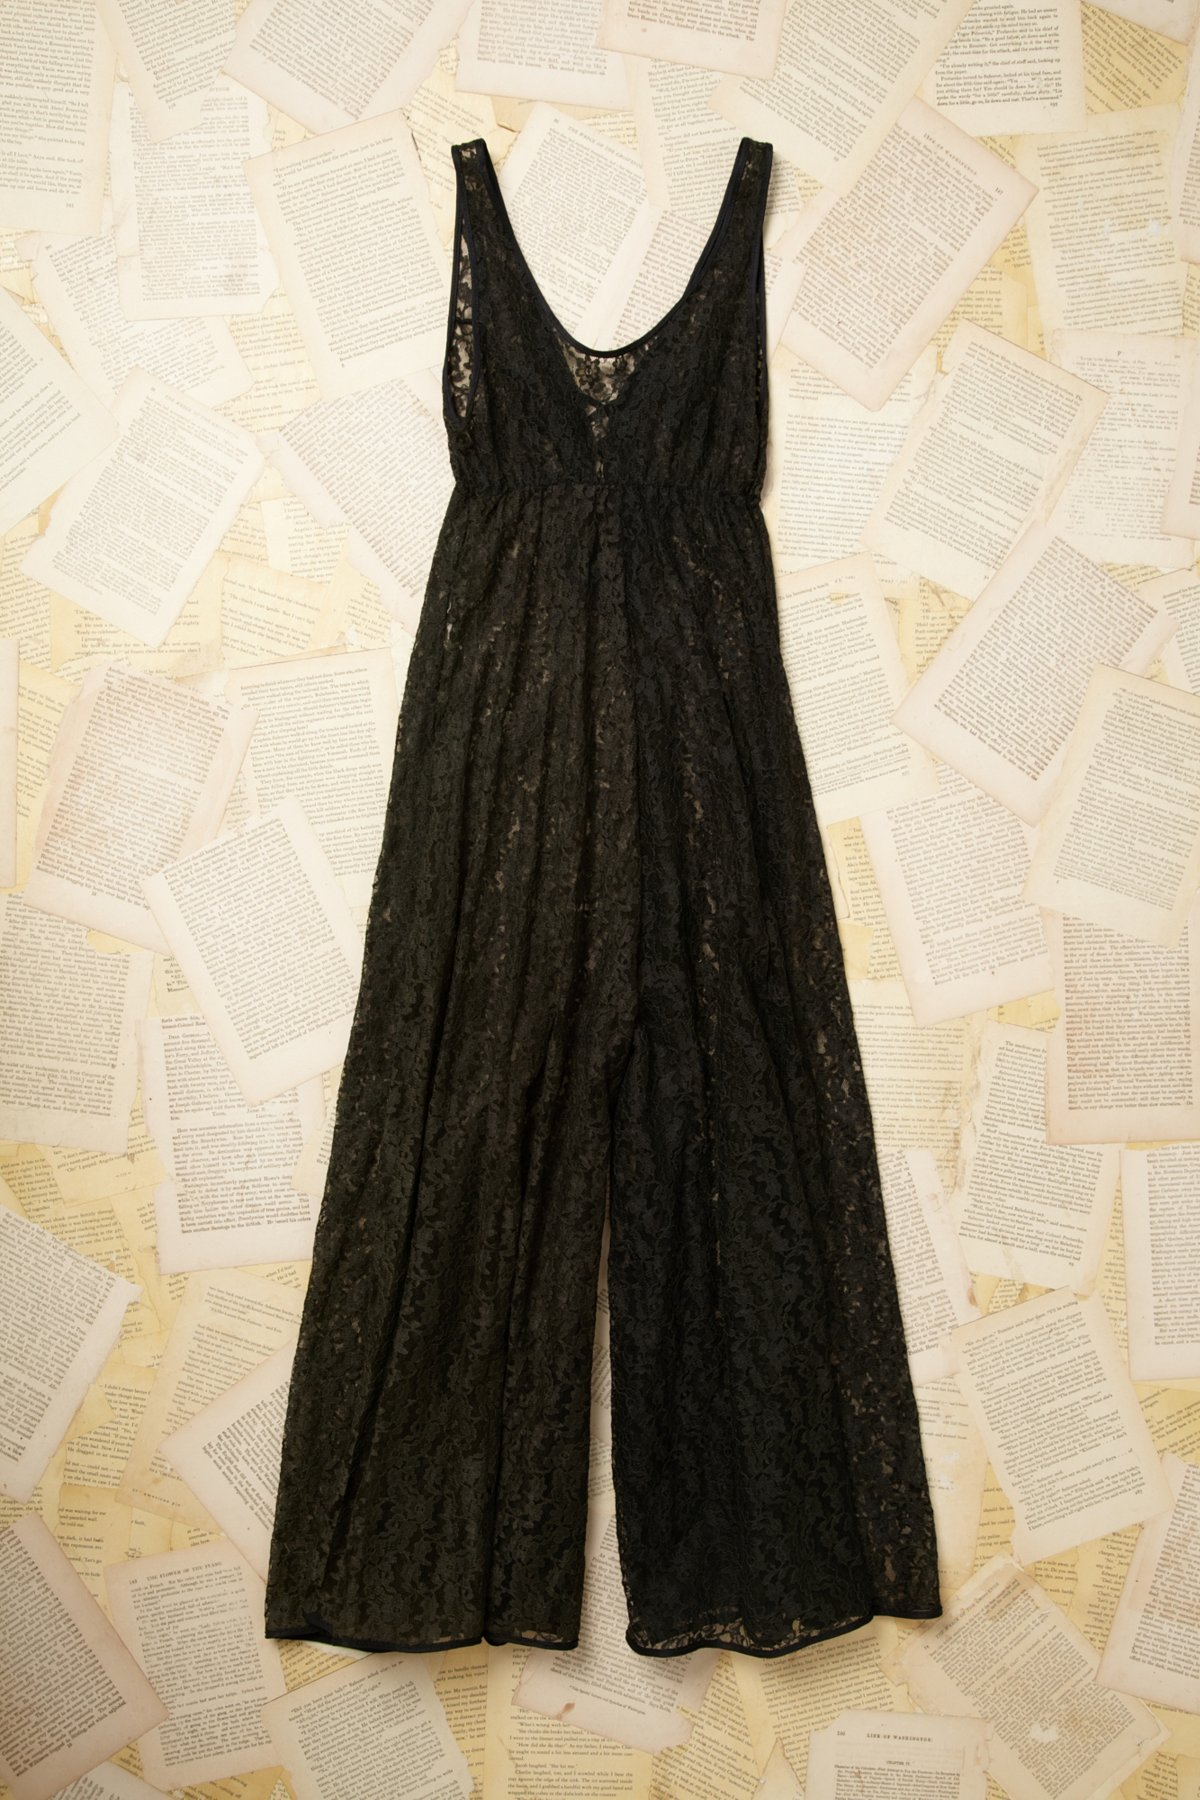 Vintage Lace Long Legged Romper